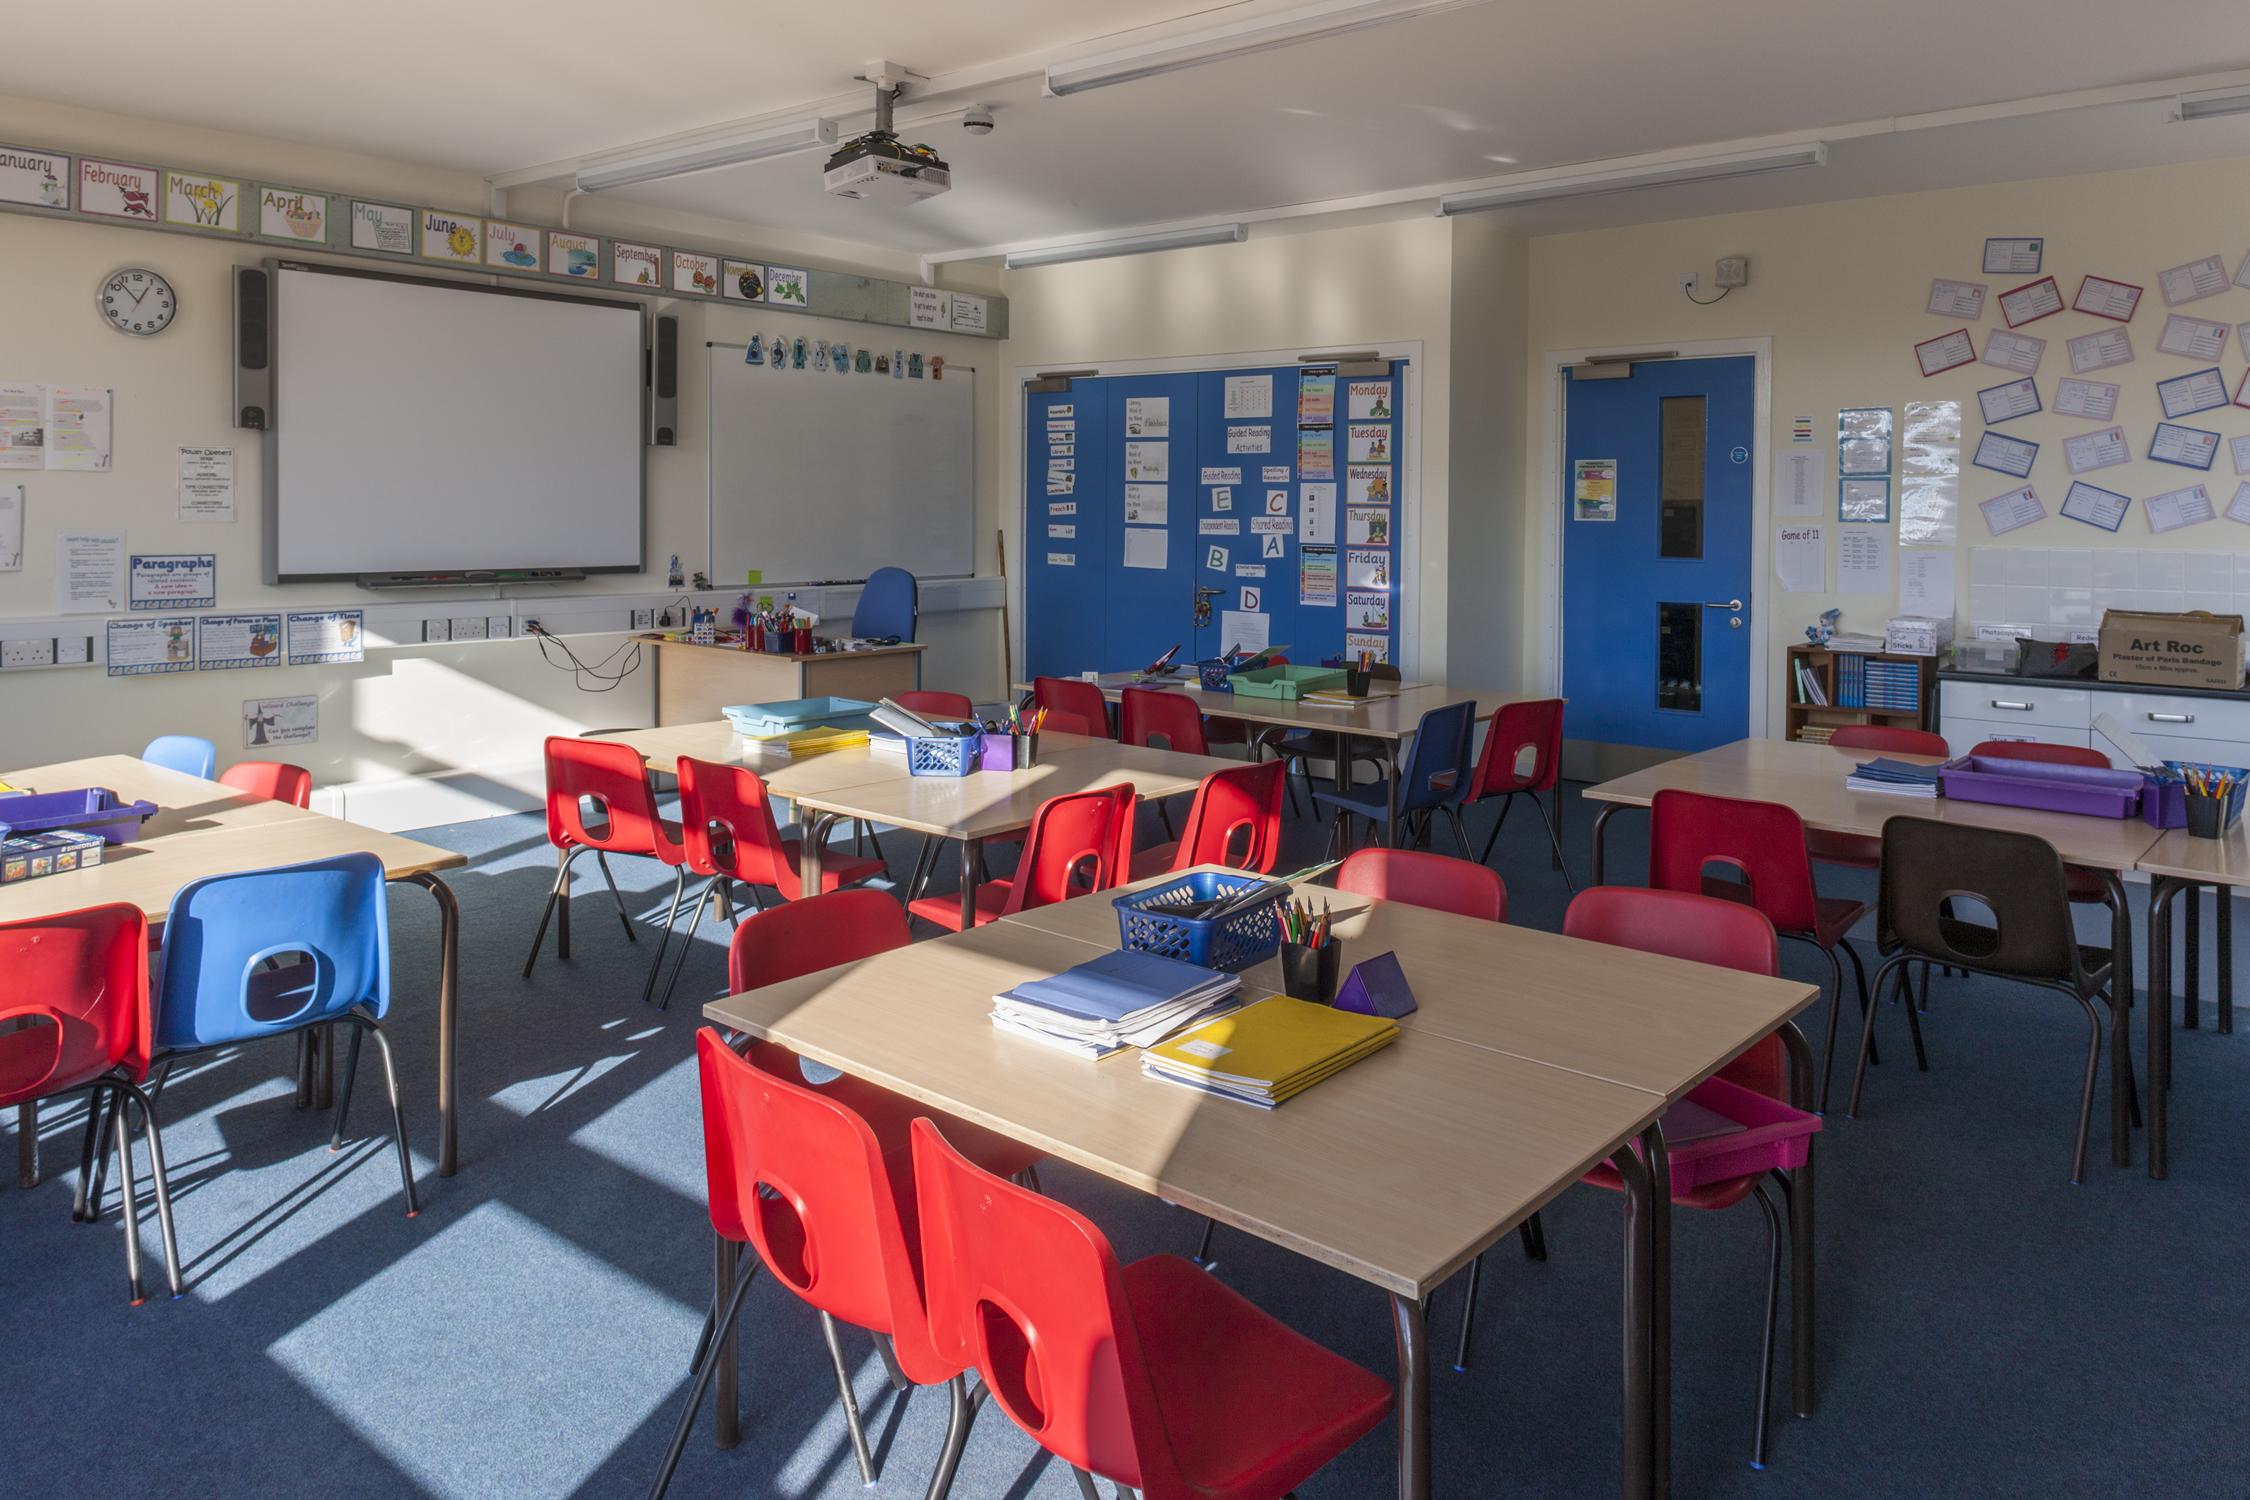 grove-infant-and-primary-school-5.jpg